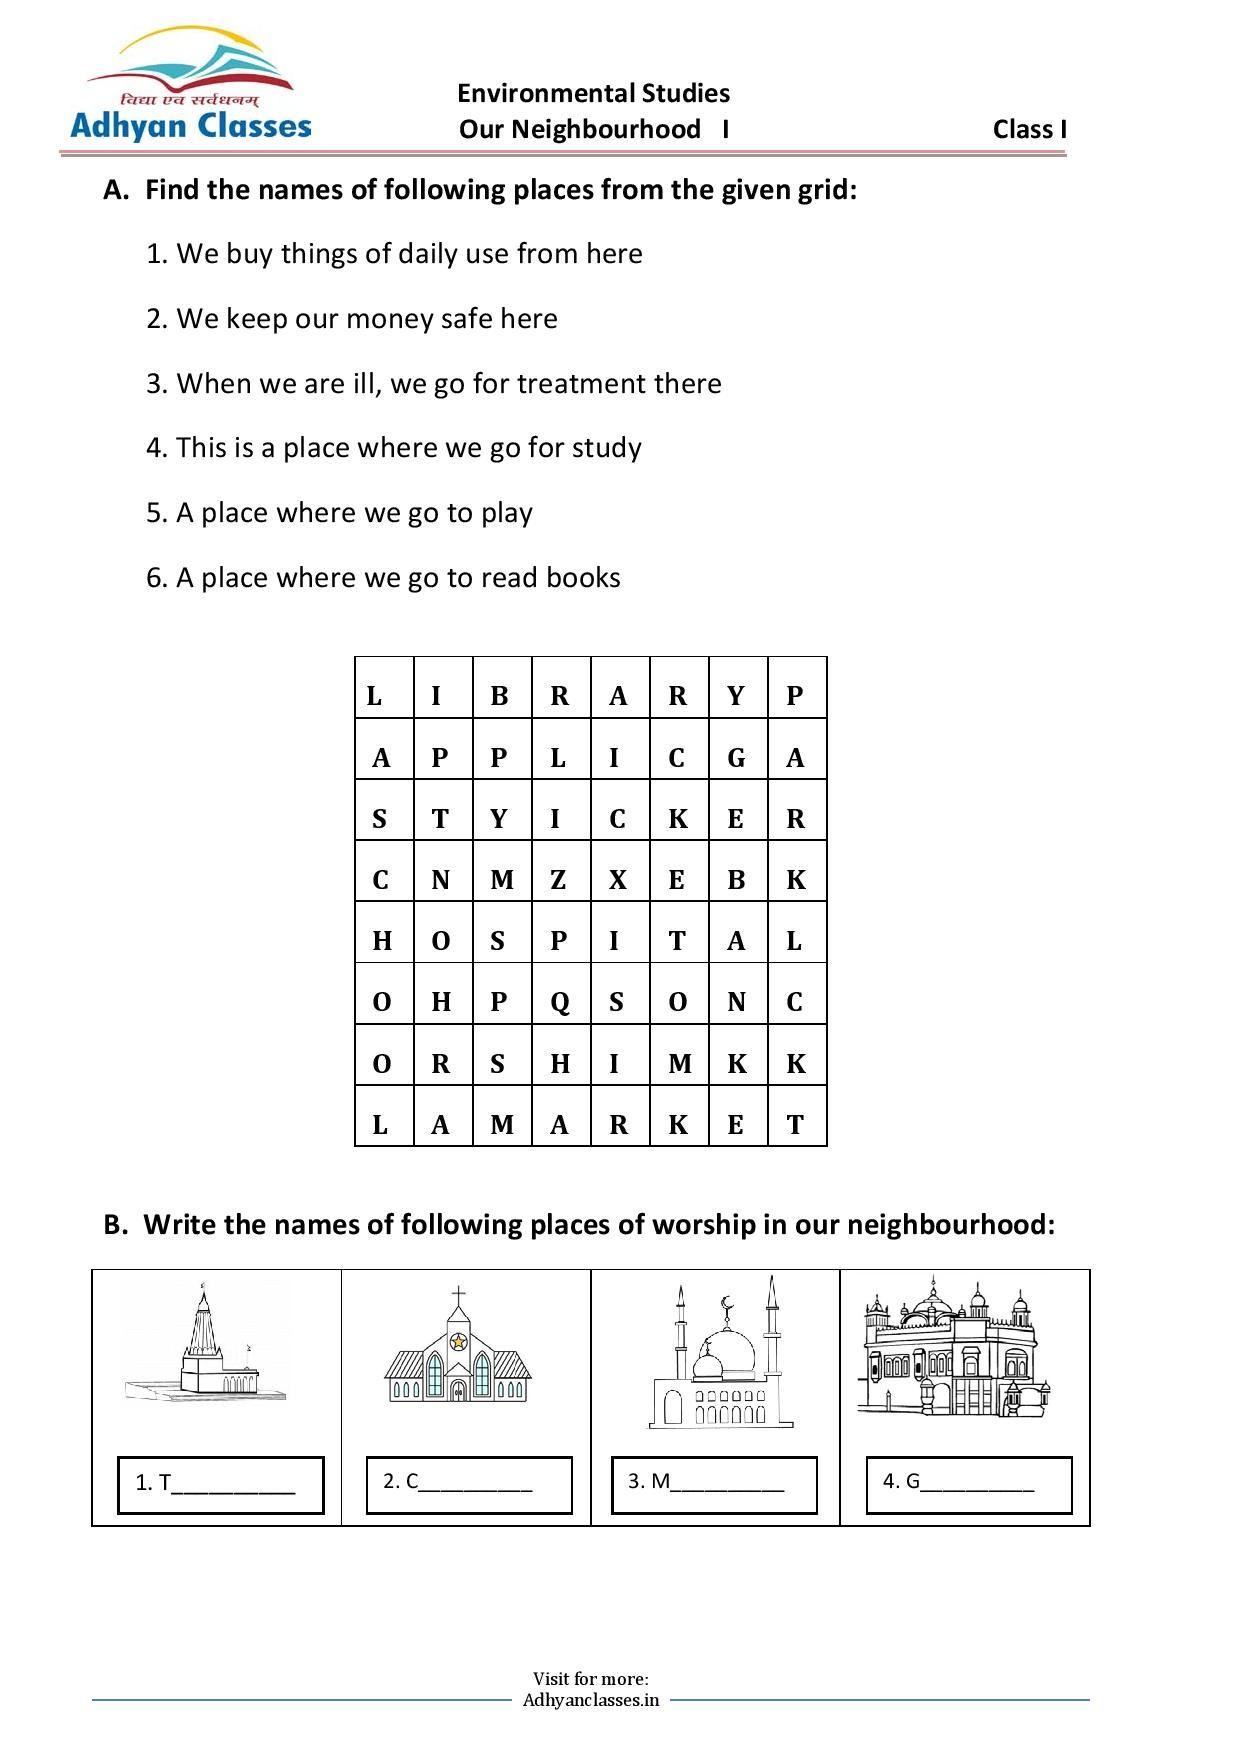 medium resolution of Our Neighbourhood Worksheet II for Grade I   Phonics rules